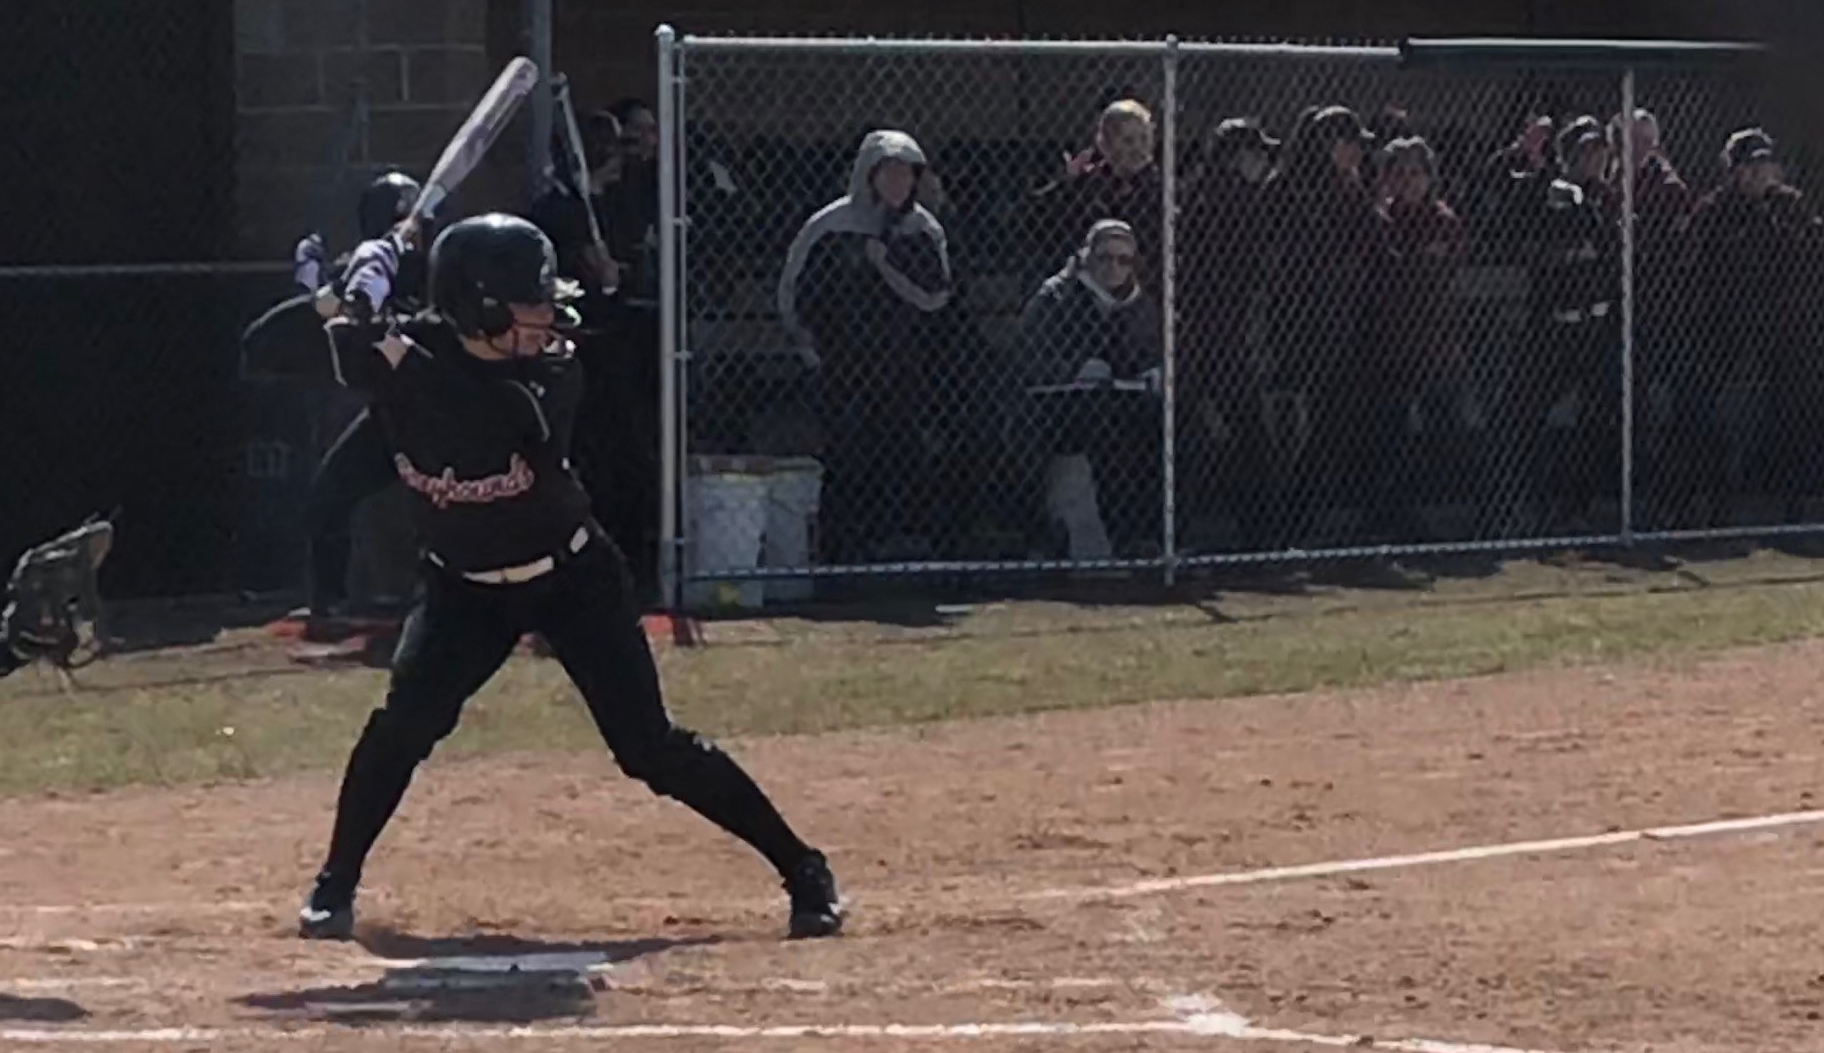 Taylor swing